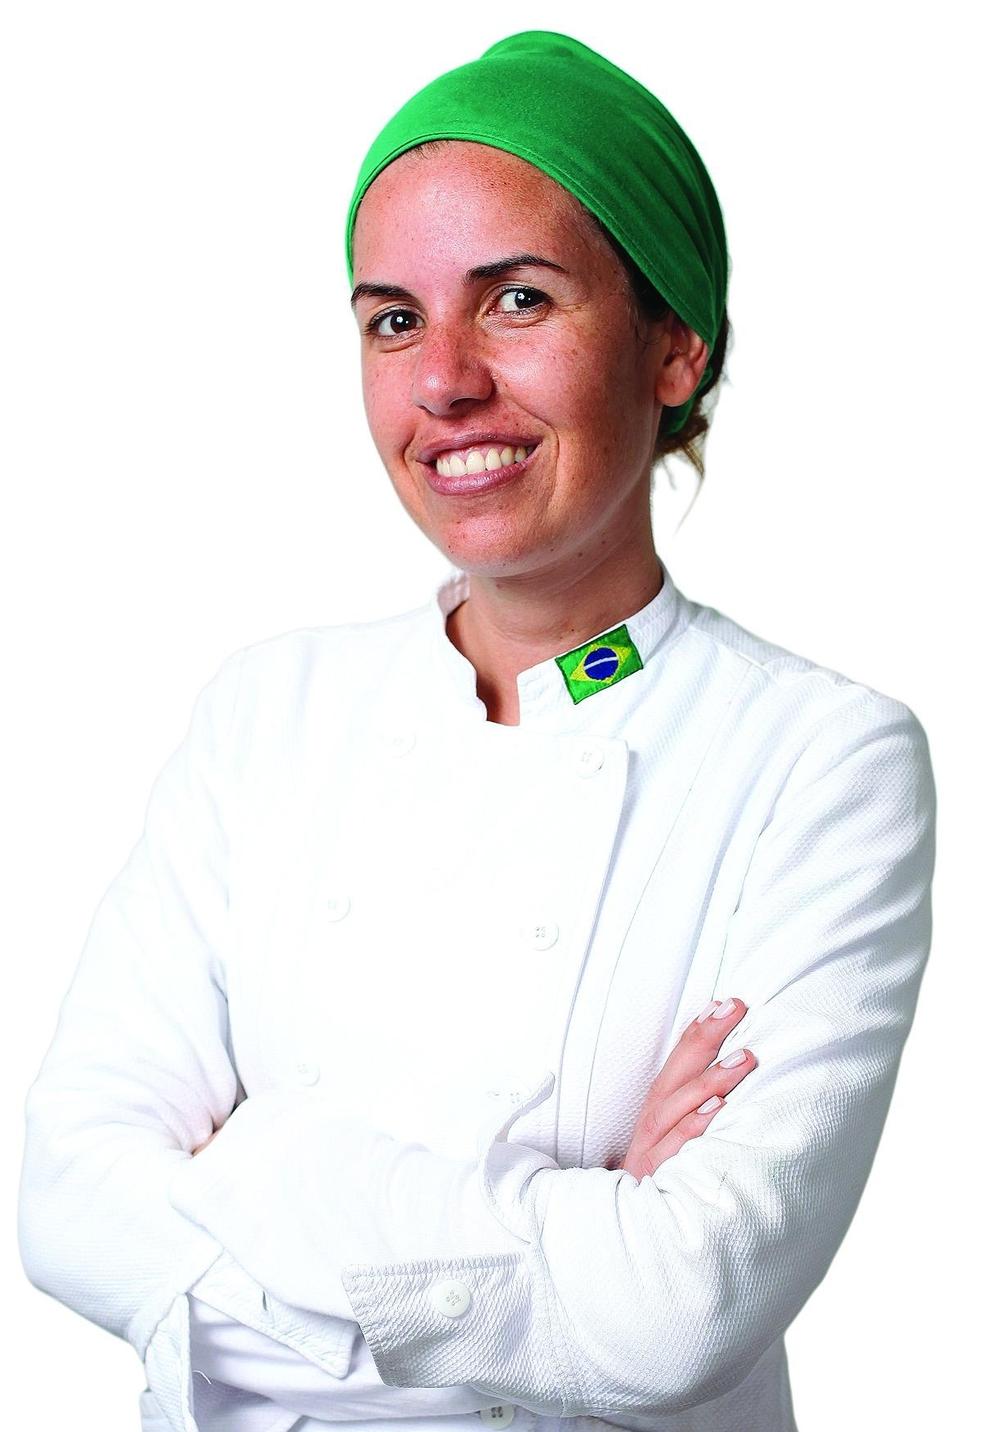 Oficial-Morena Leite.jpg